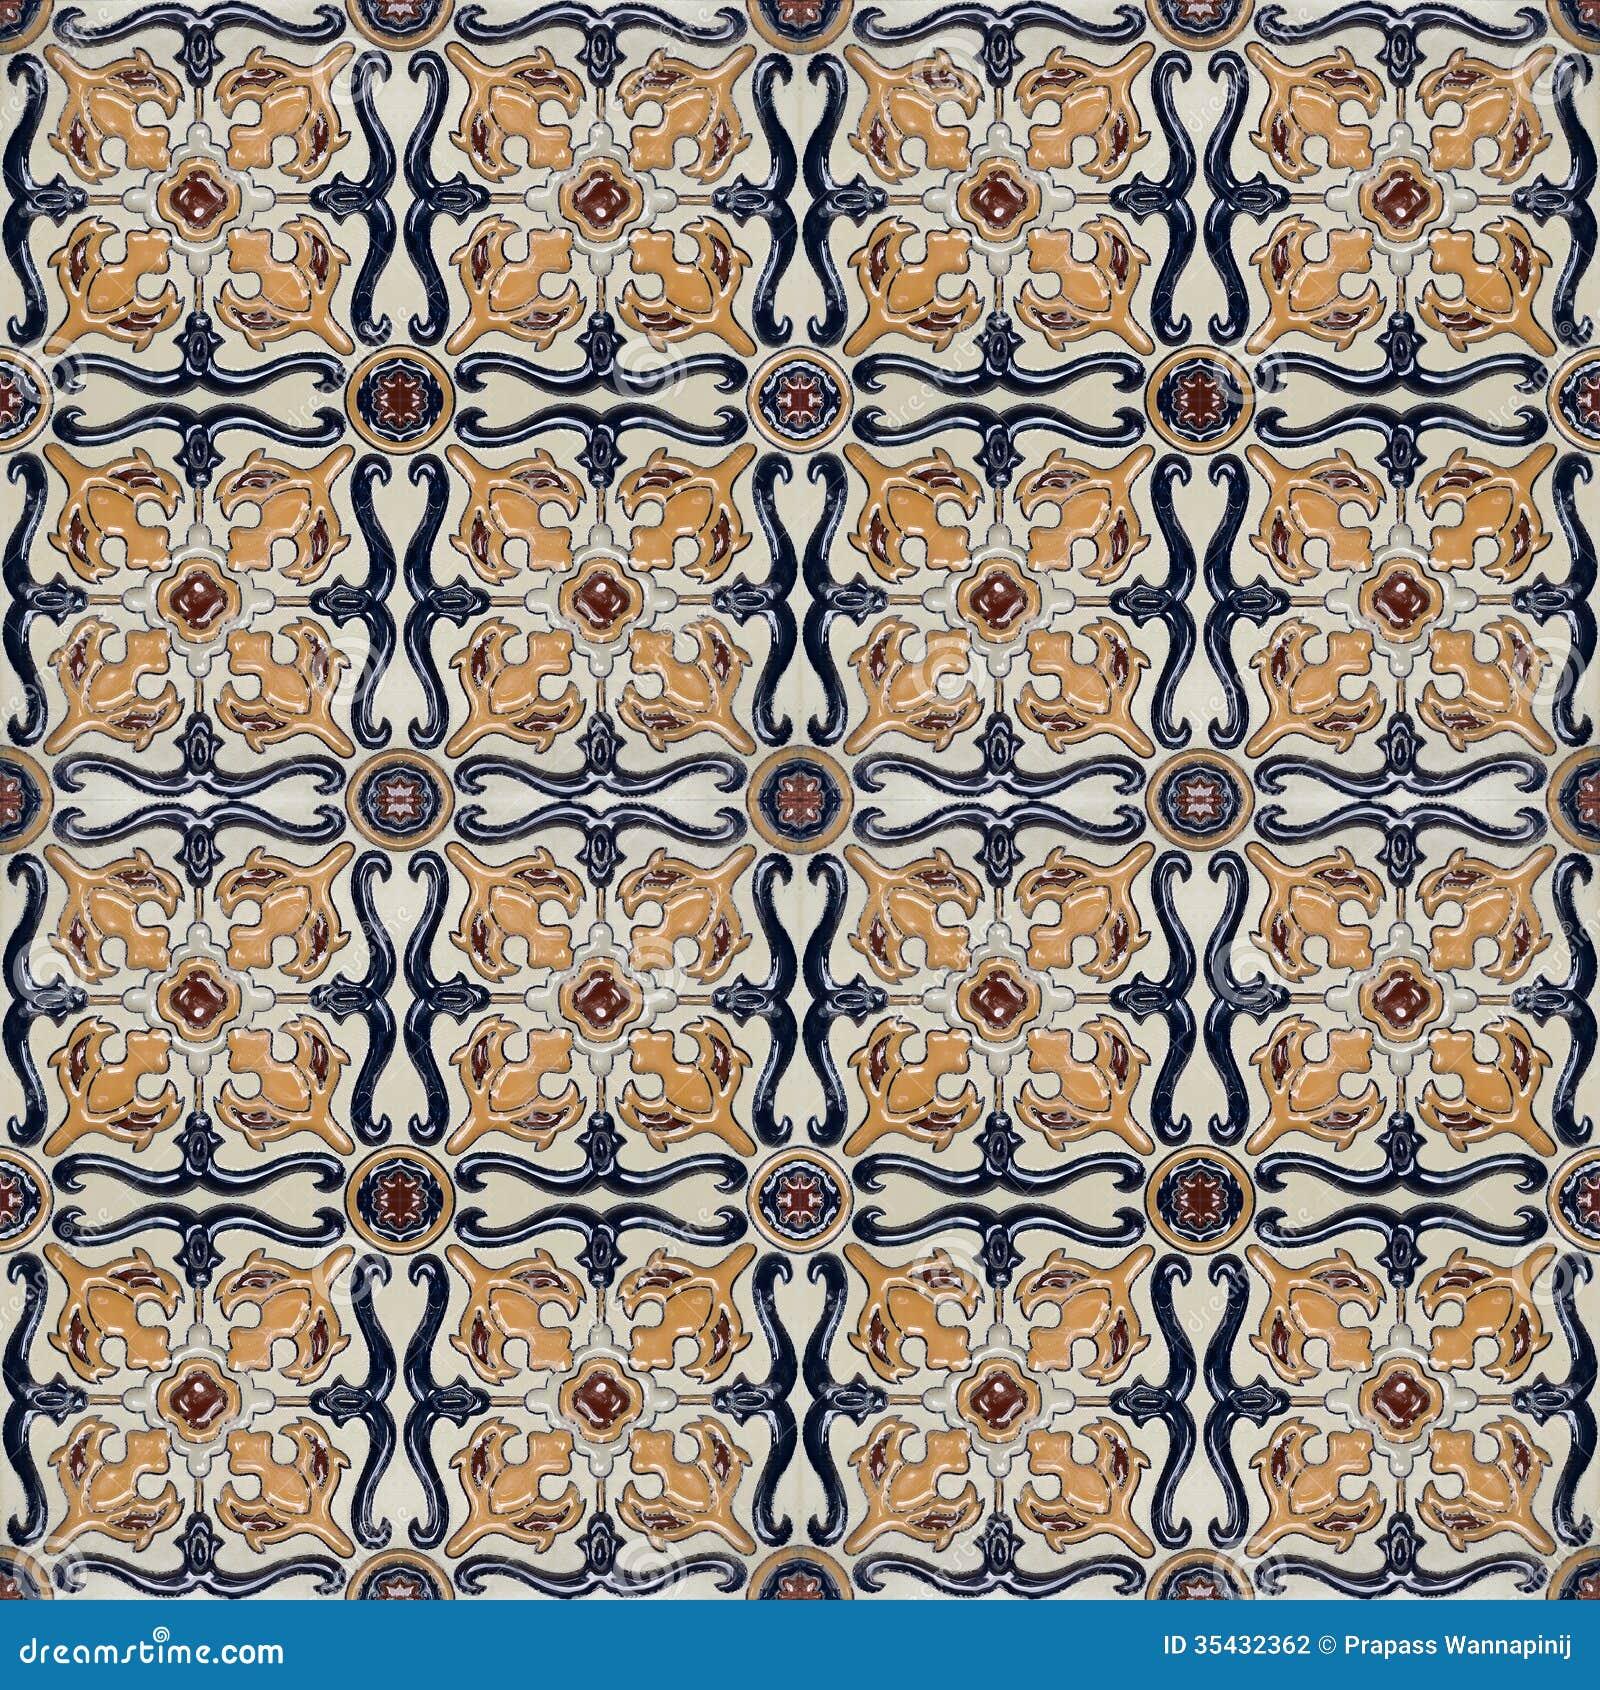 Spanich摩洛哥样式葡萄酒陶瓷砖